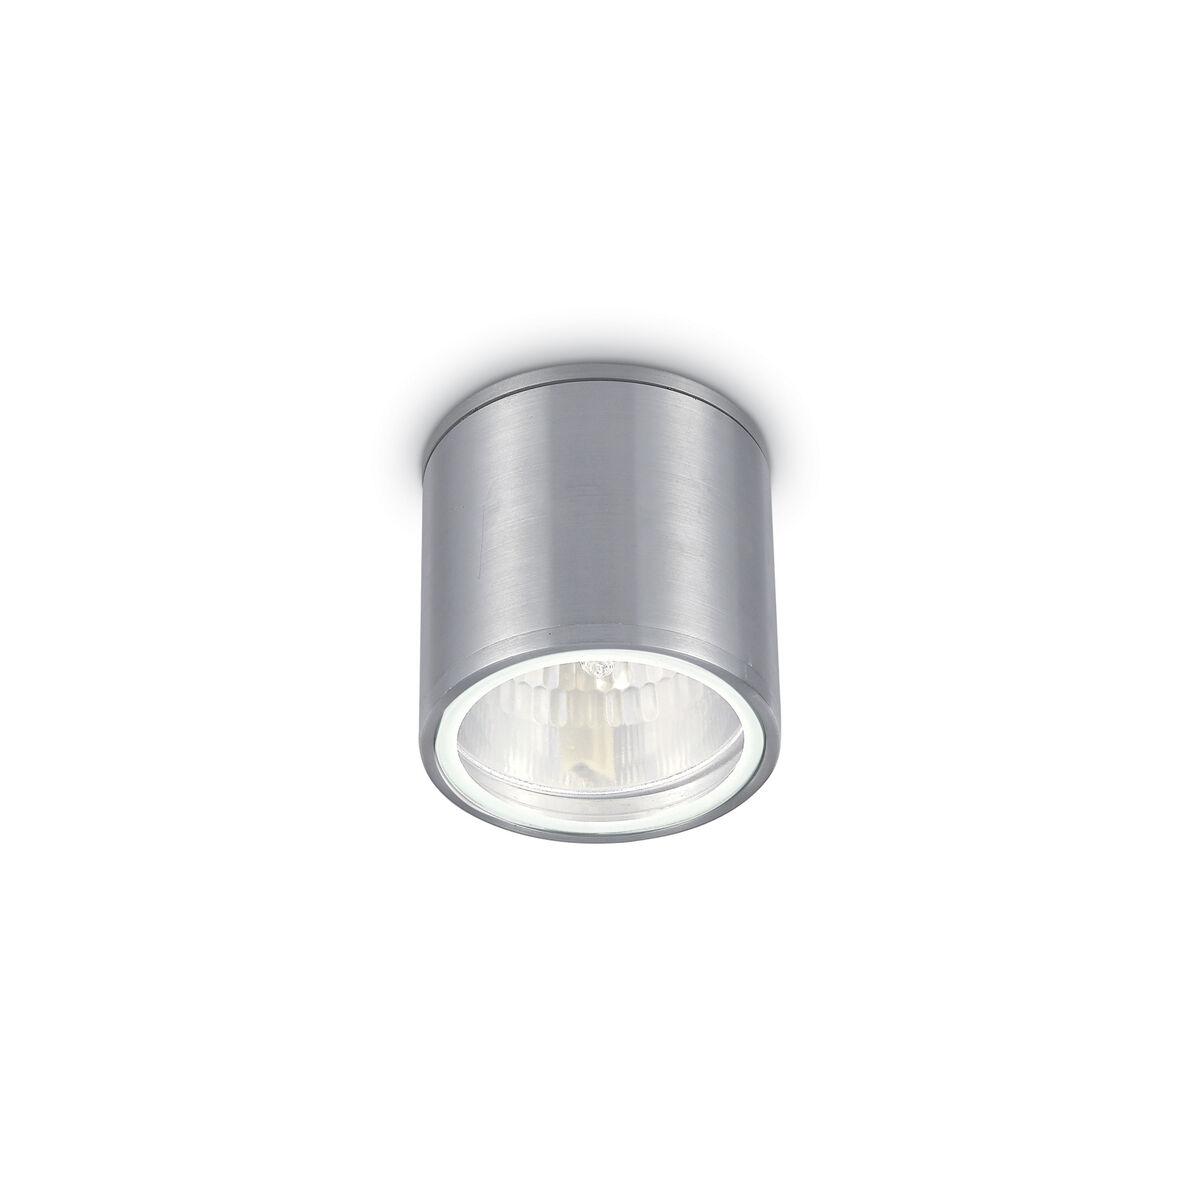 LED valoruukku LARGE, 37x37x40 cm, 6m johdolla, ulkokäyttöön